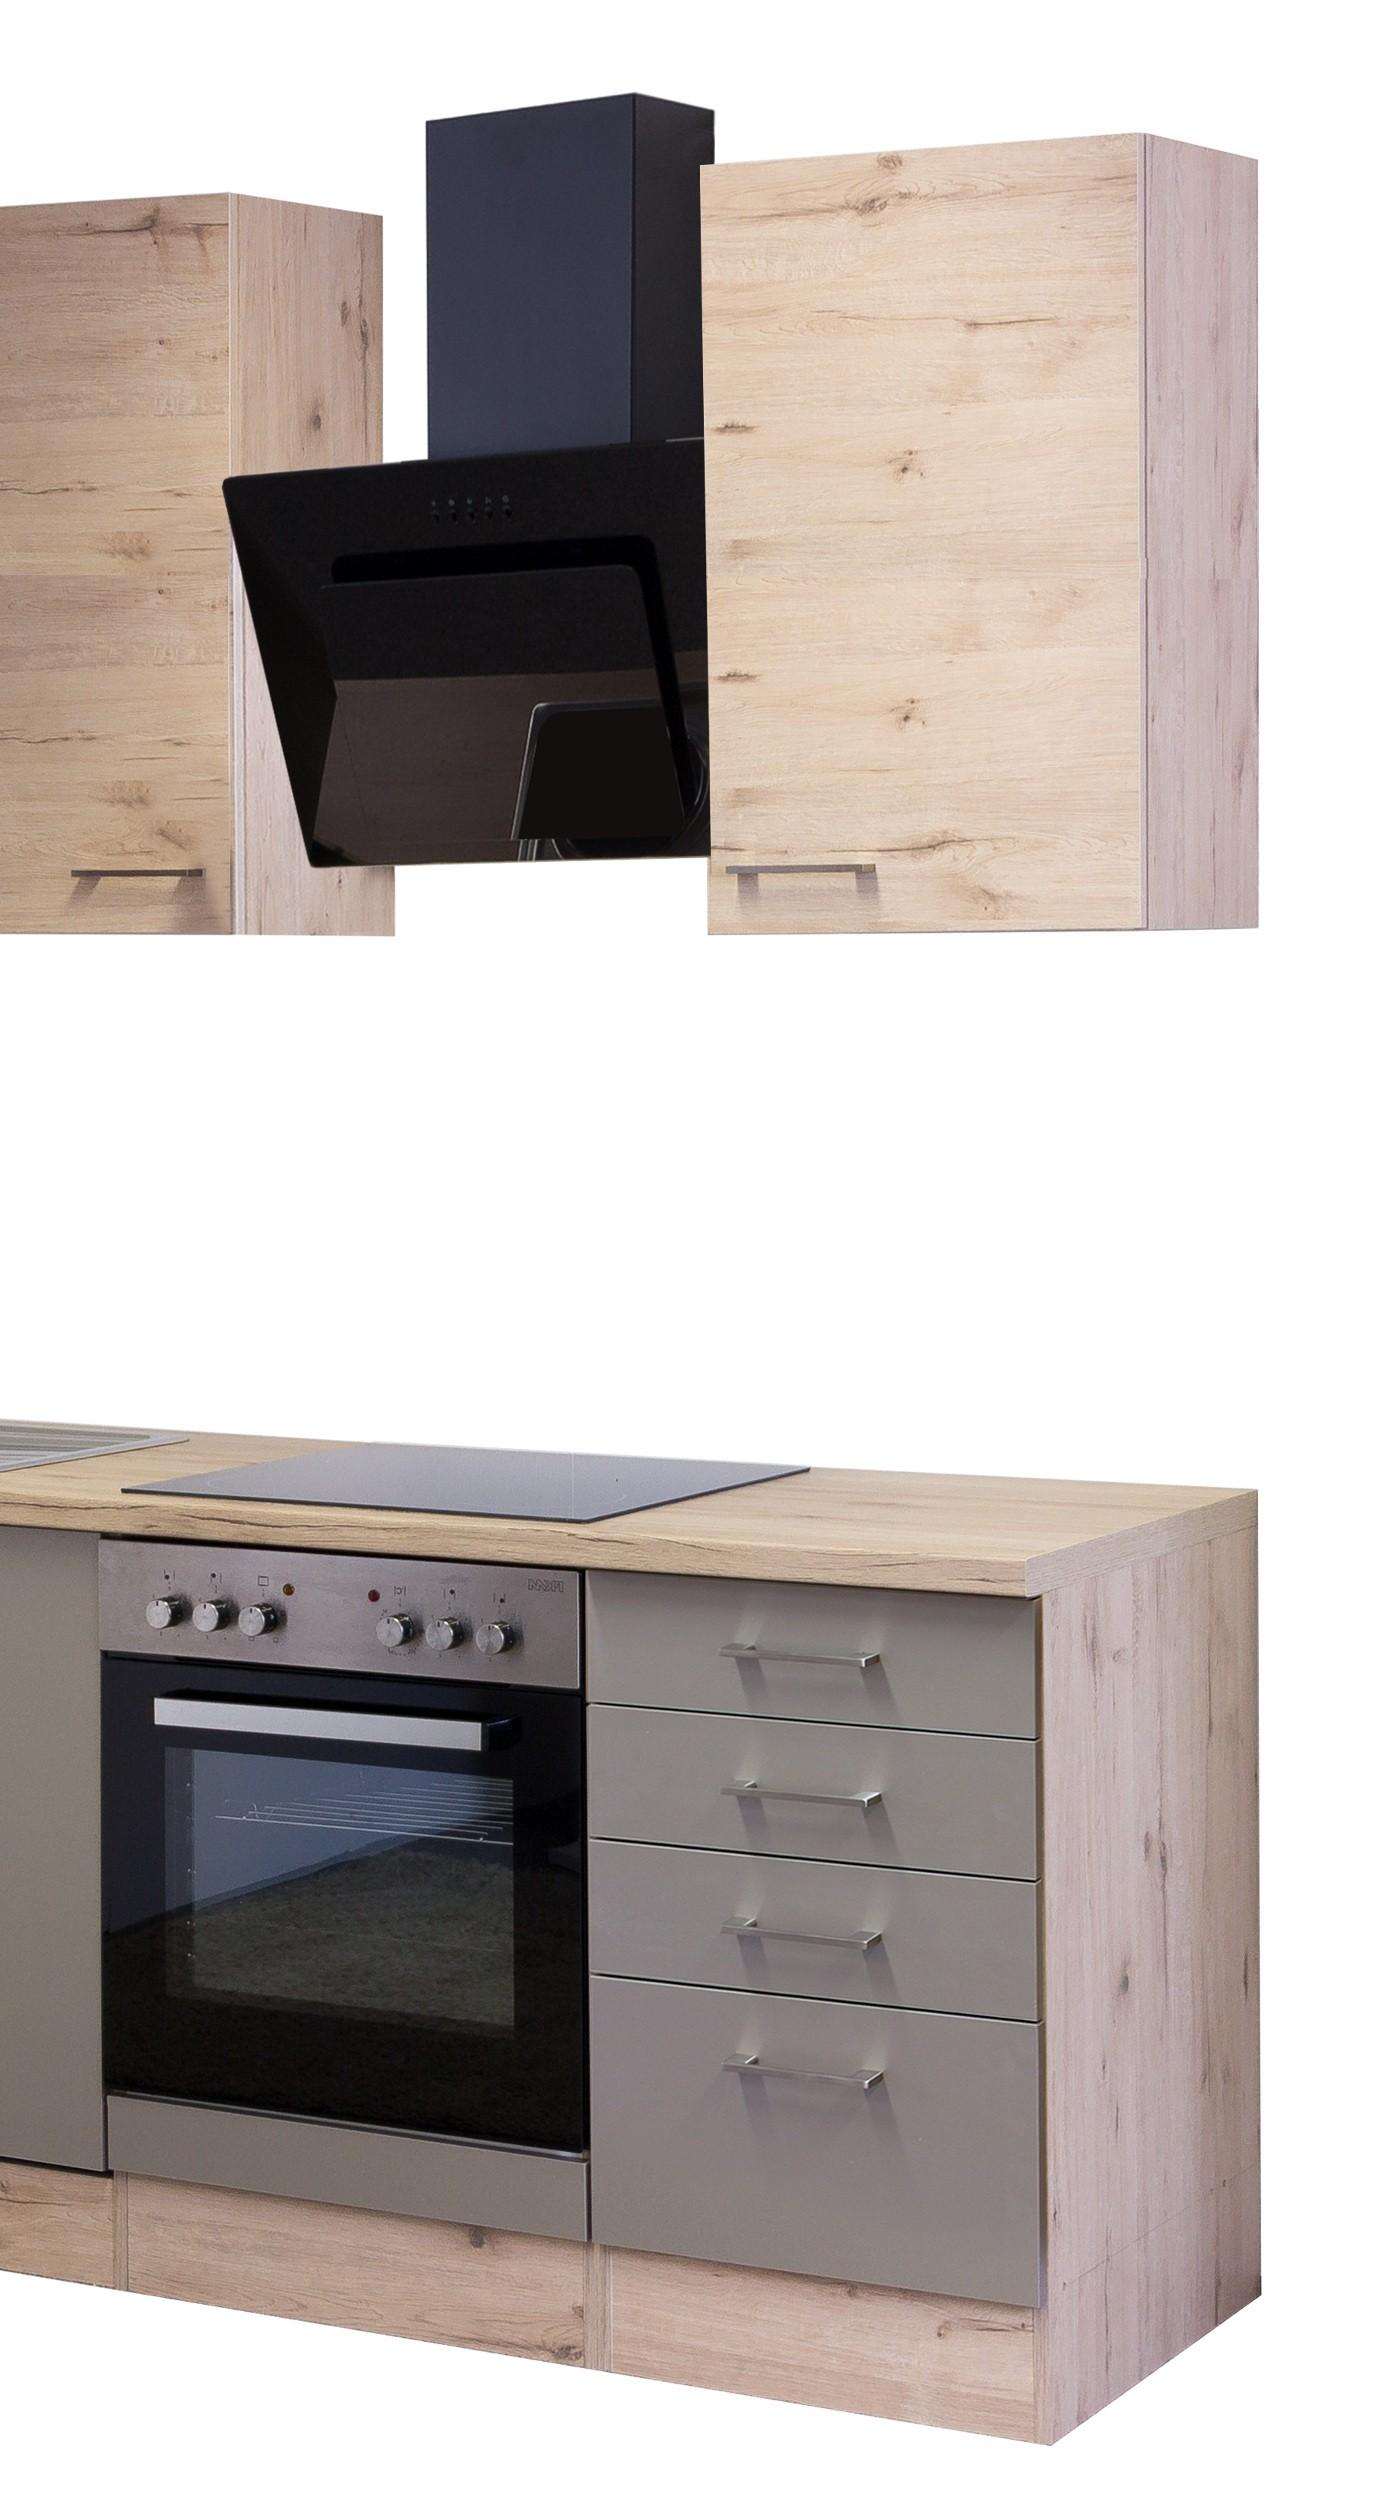 k chenblock riva k chenzeile mit elektroger ten 220 cm bronze metallic ebay. Black Bedroom Furniture Sets. Home Design Ideas